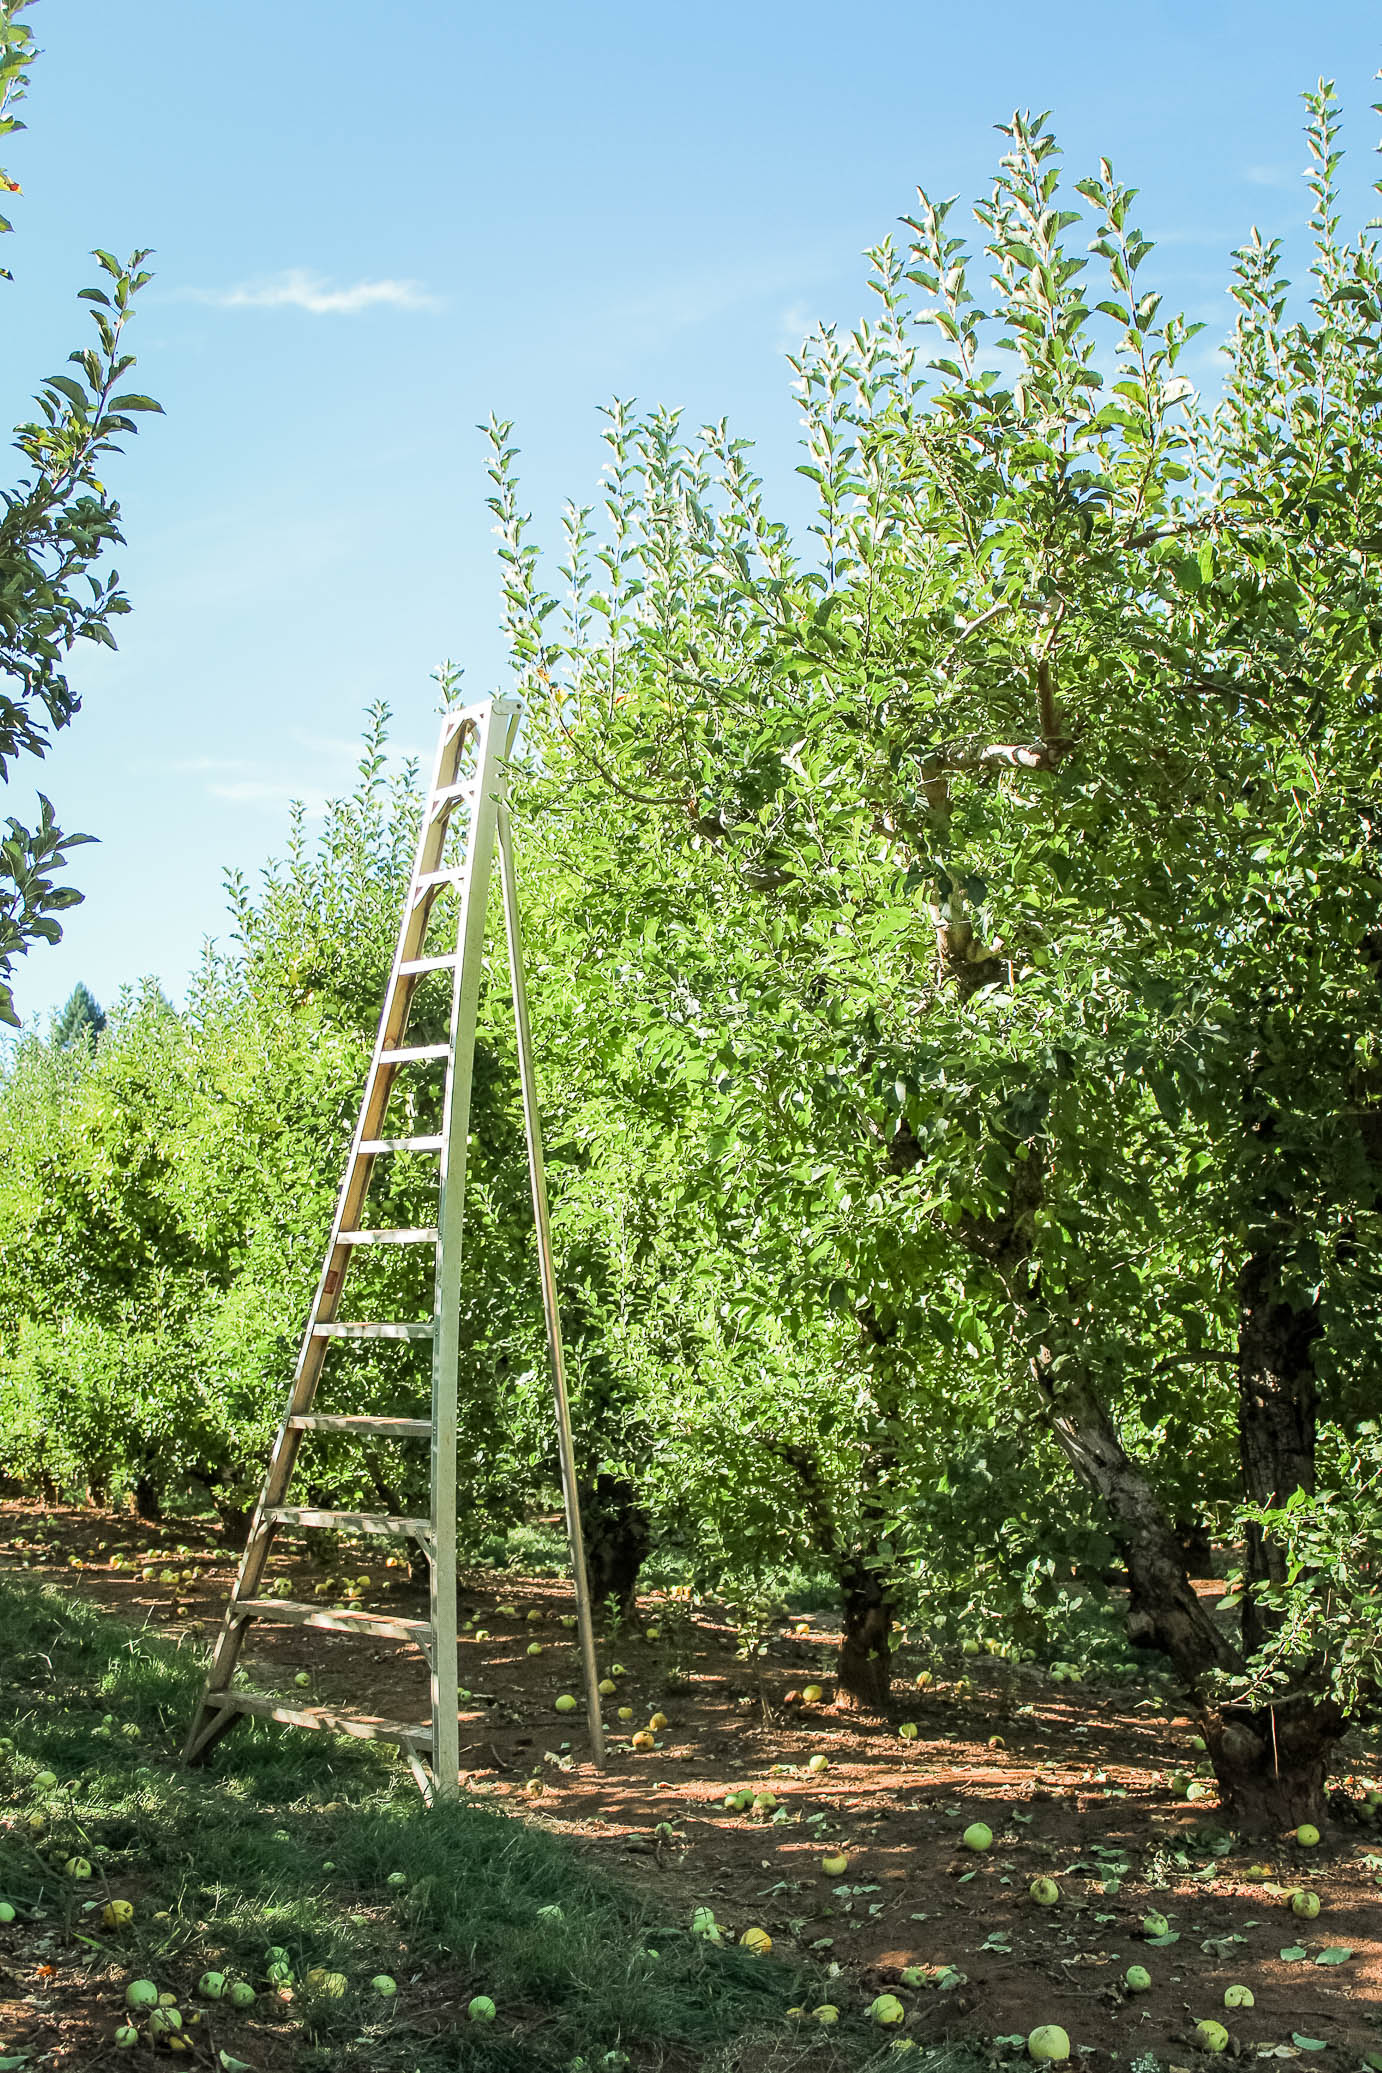 Apple trees at Kids Inc/Delfino Family Farm in Apple Hill, CA